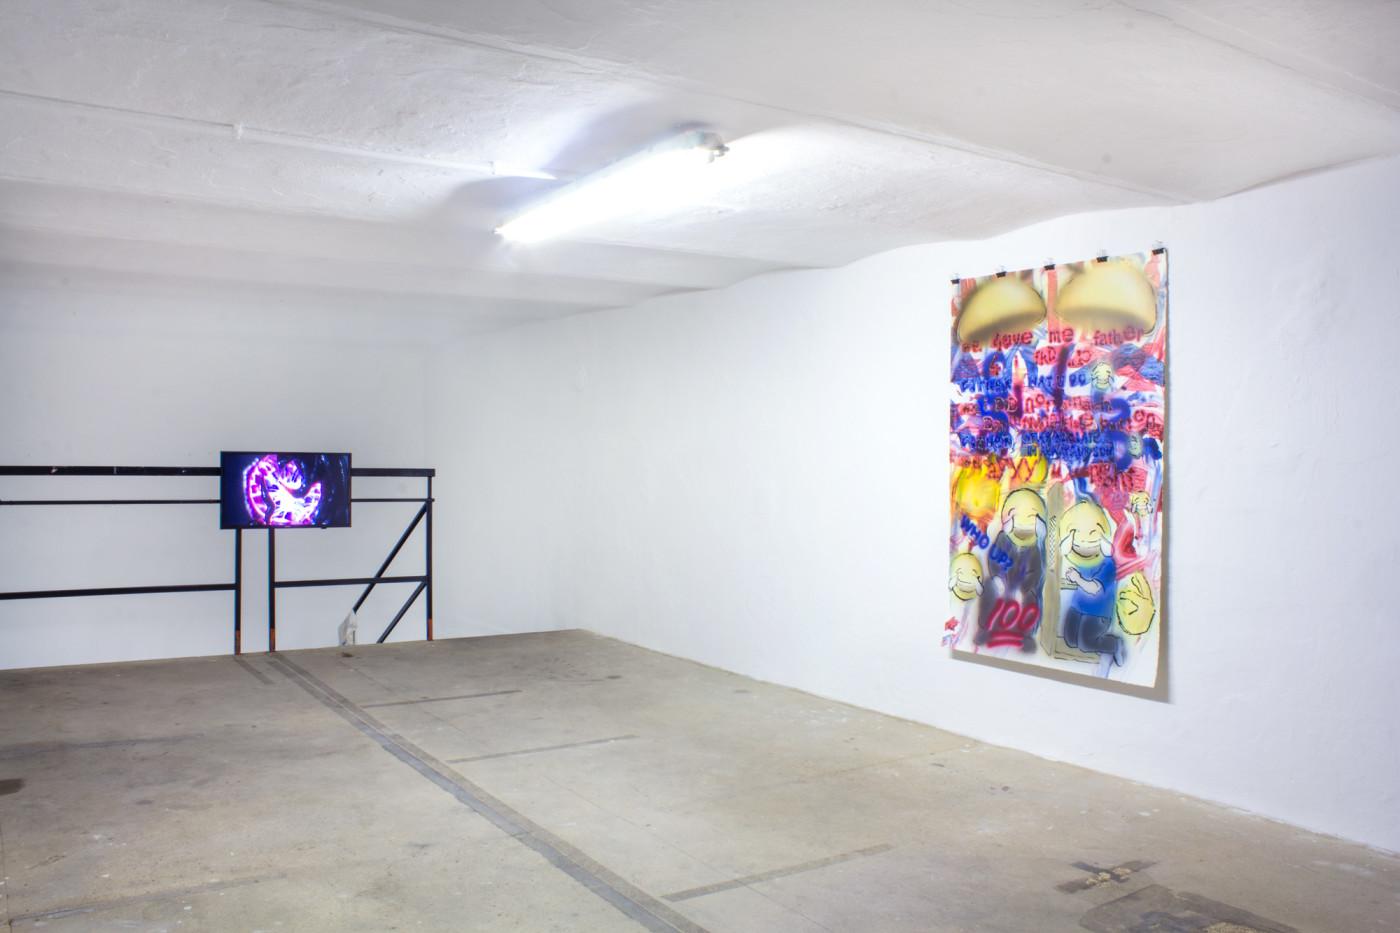 bb5000studio_corazon_installation_view_6